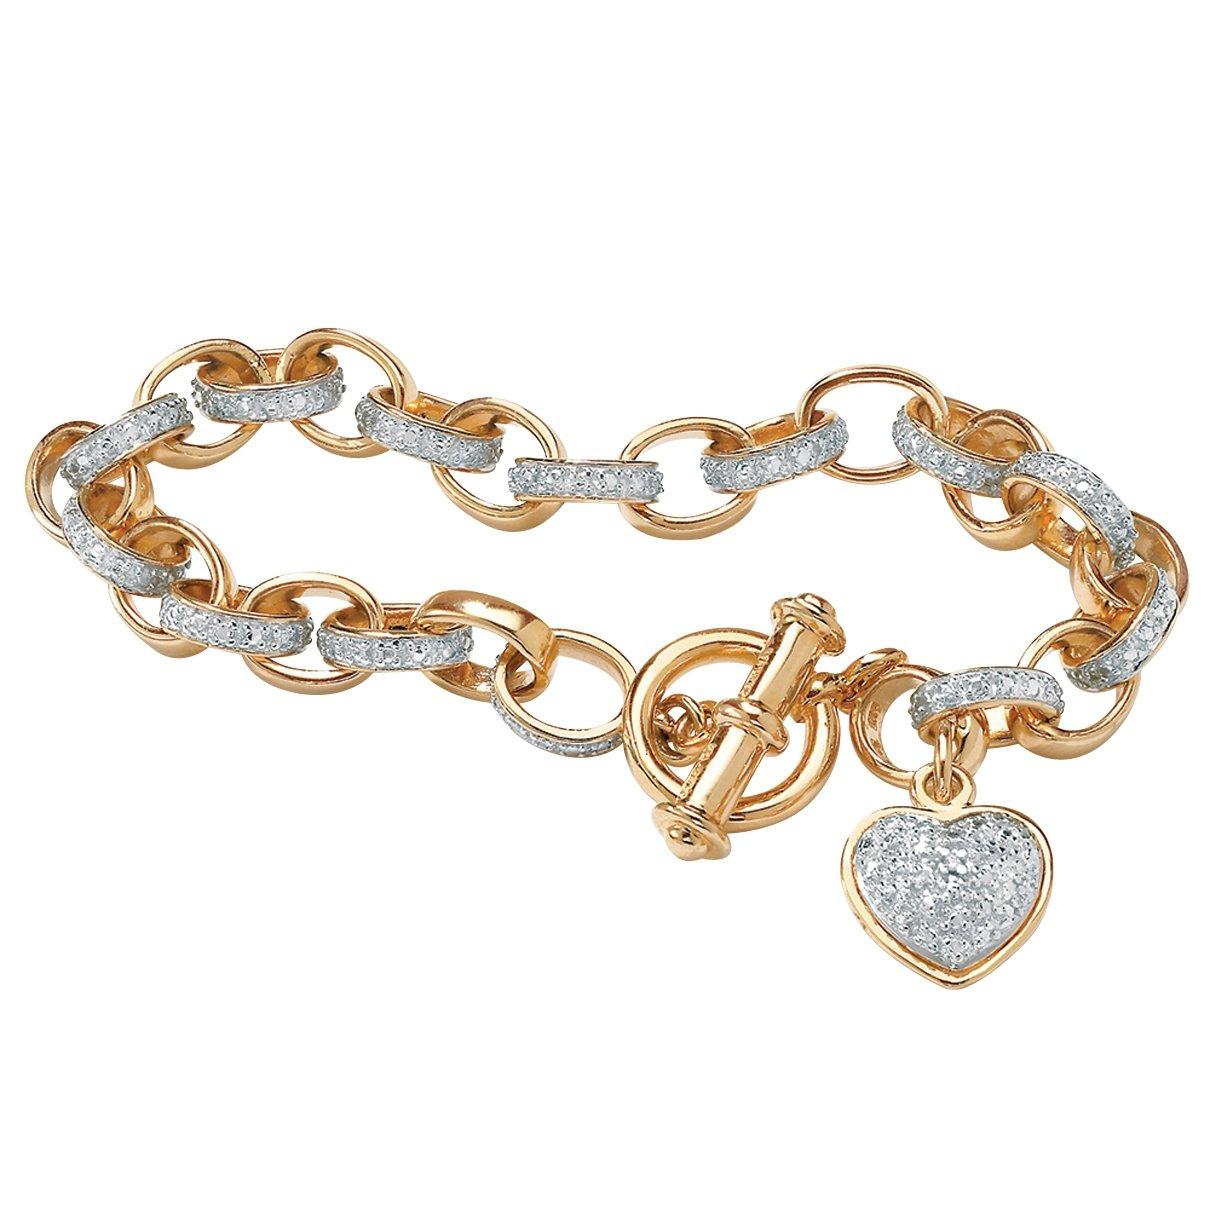 White Diamond Accent 18k Gold over .925 Silver Heart Charm Rolo-Link Bracelet 7.25''